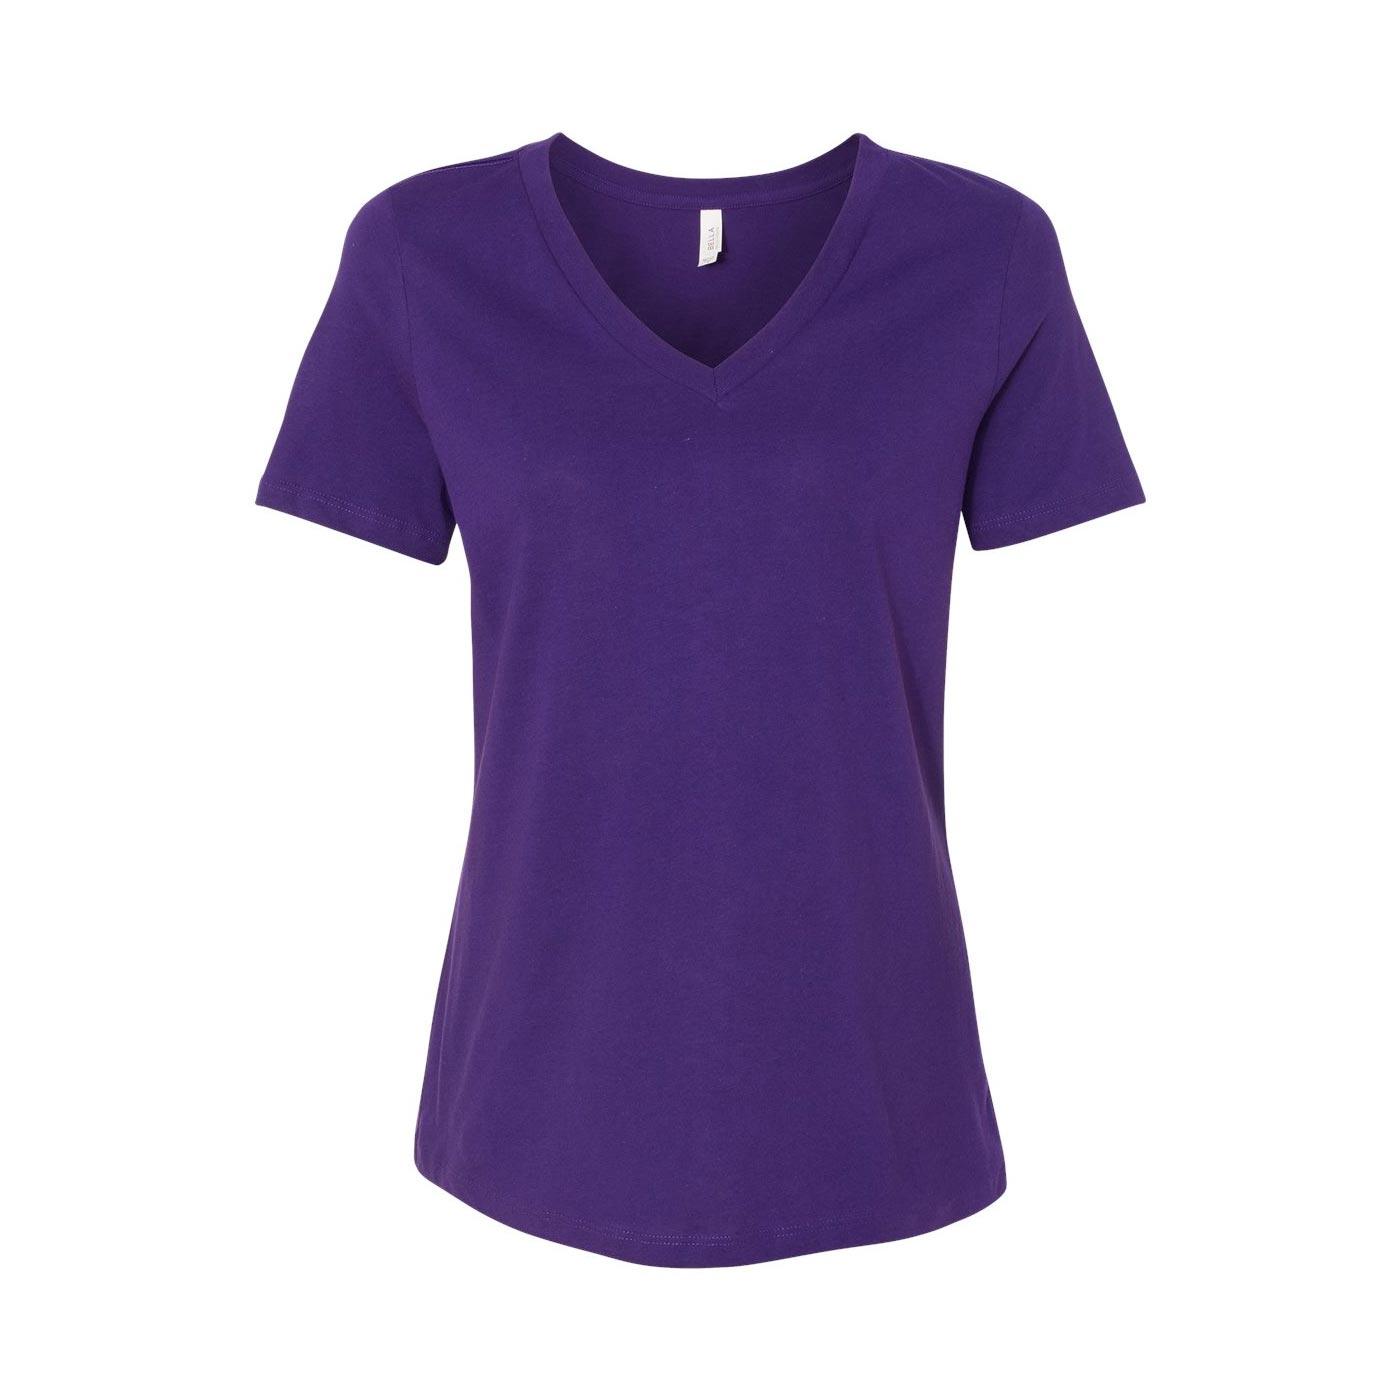 Bc vneck purple